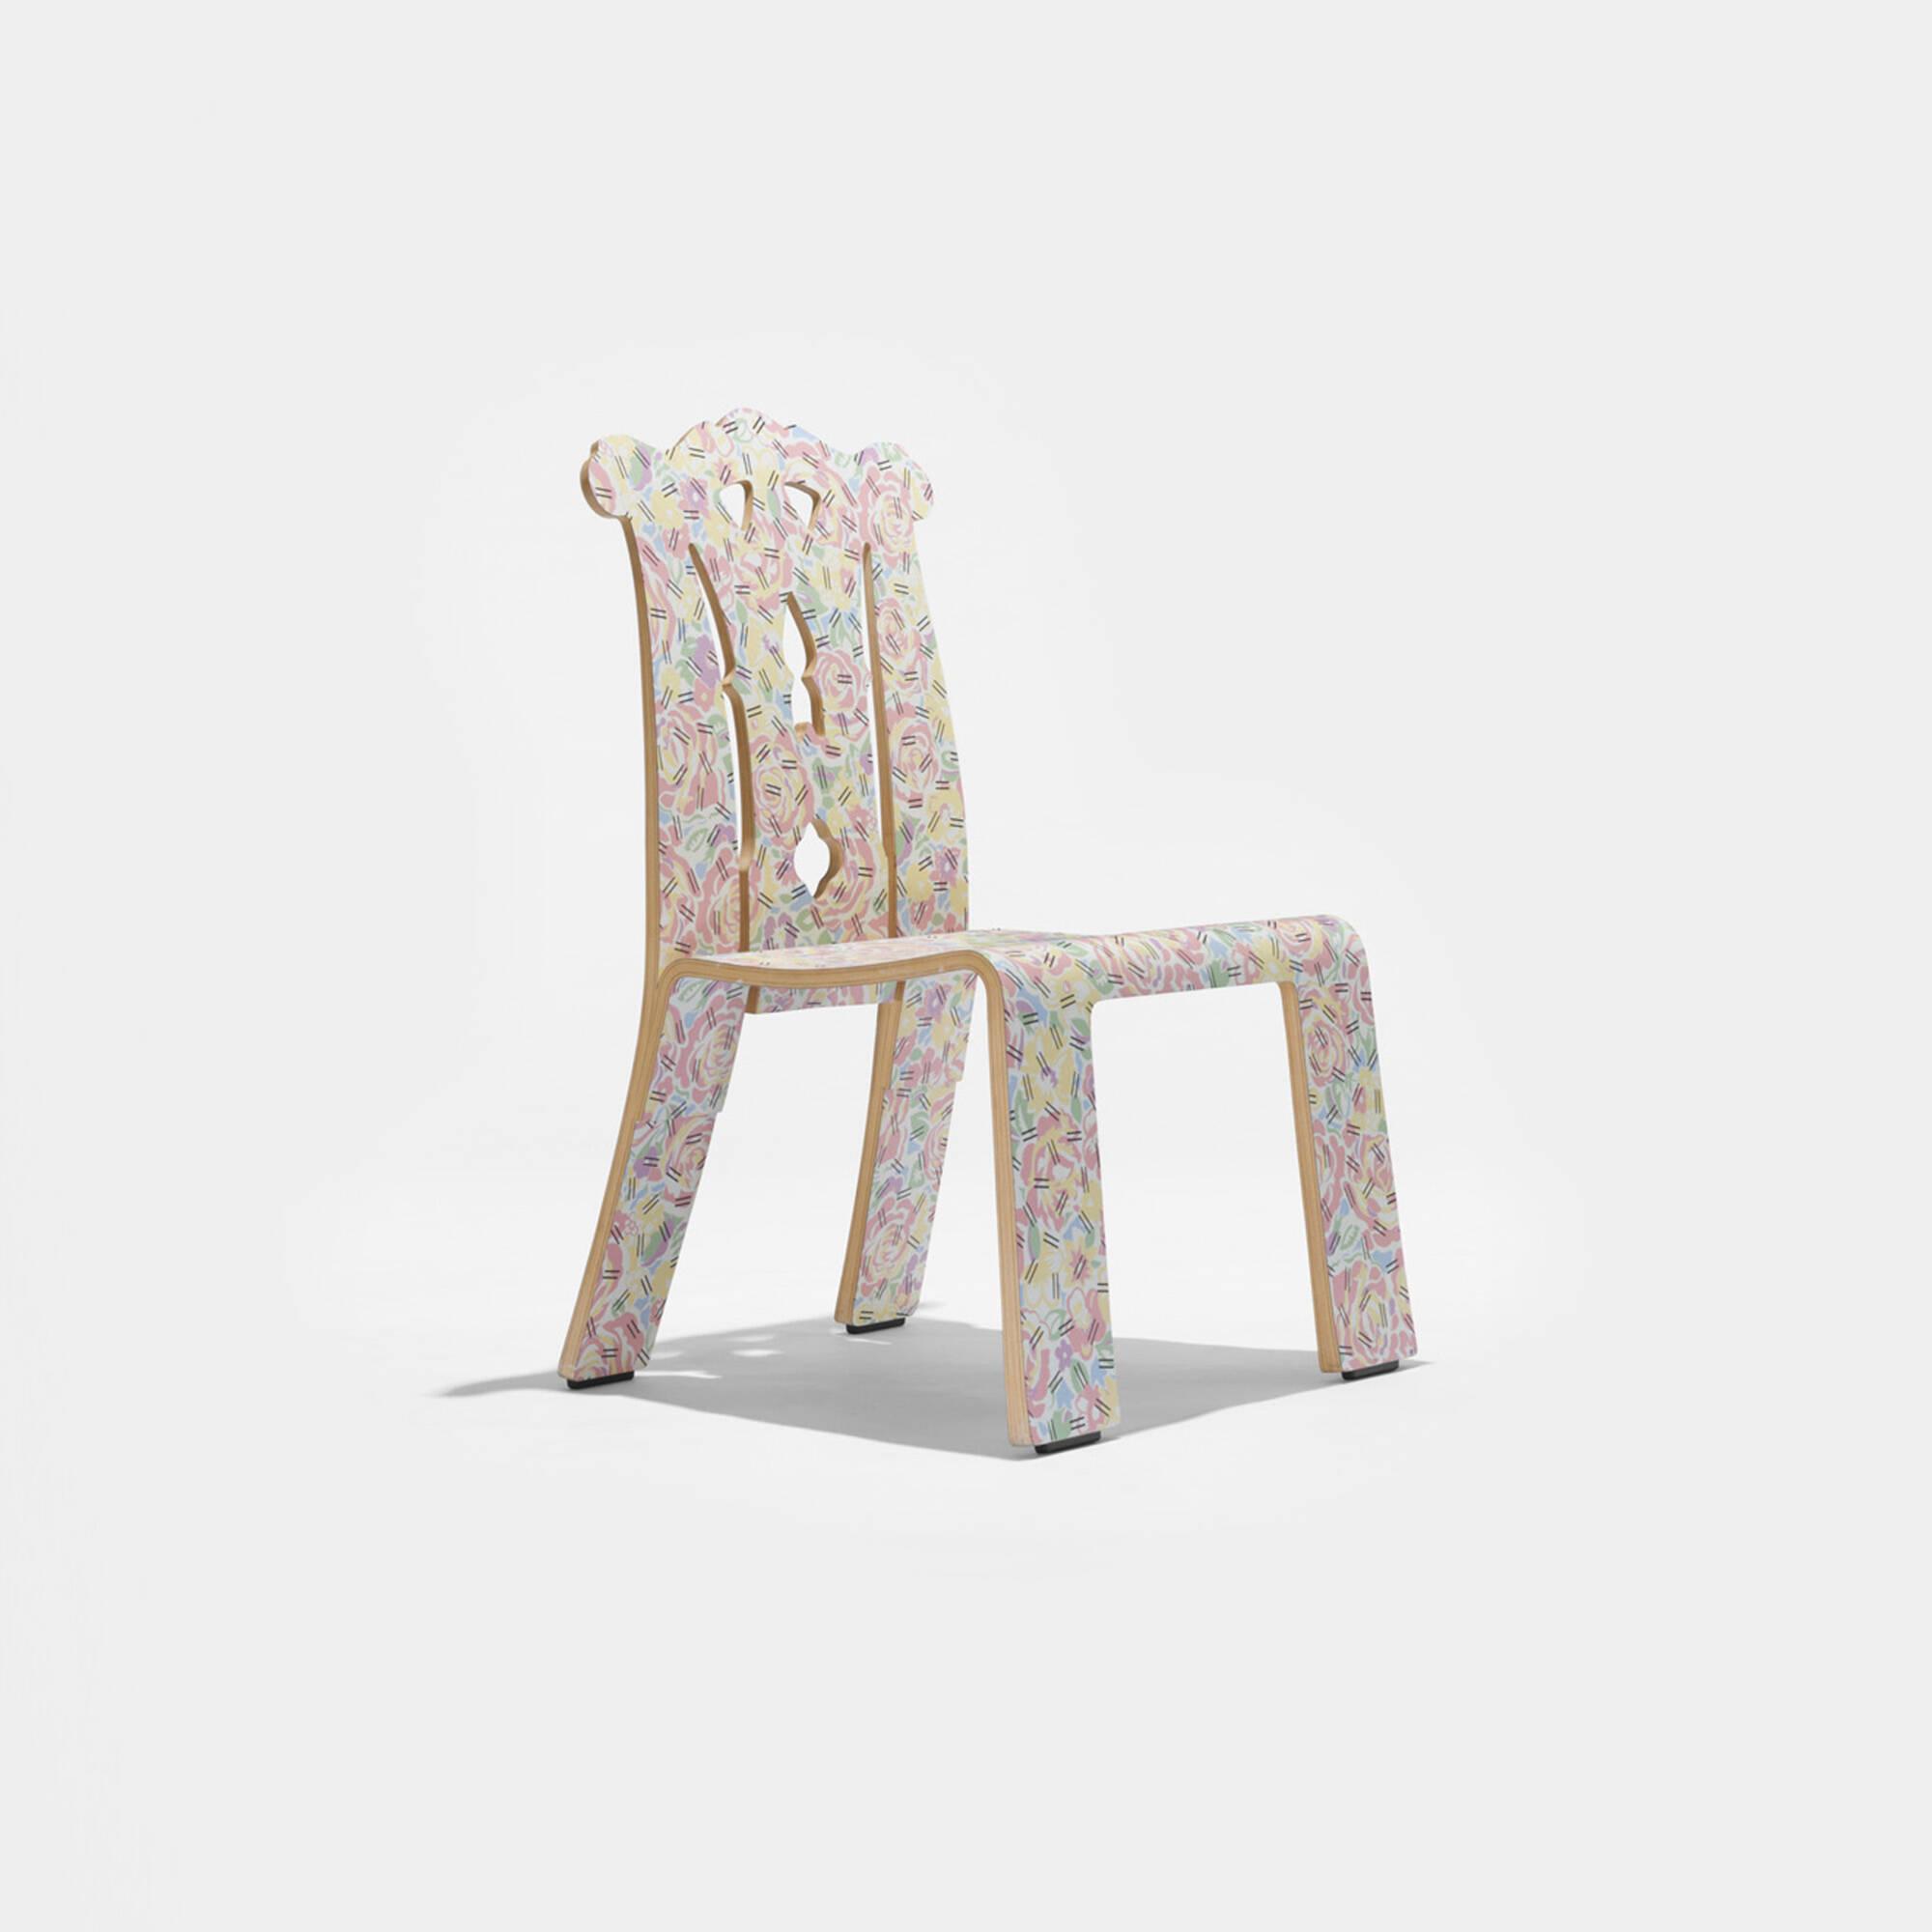 375: Robert Venturi / Chippendale Chair (1 Of 1)